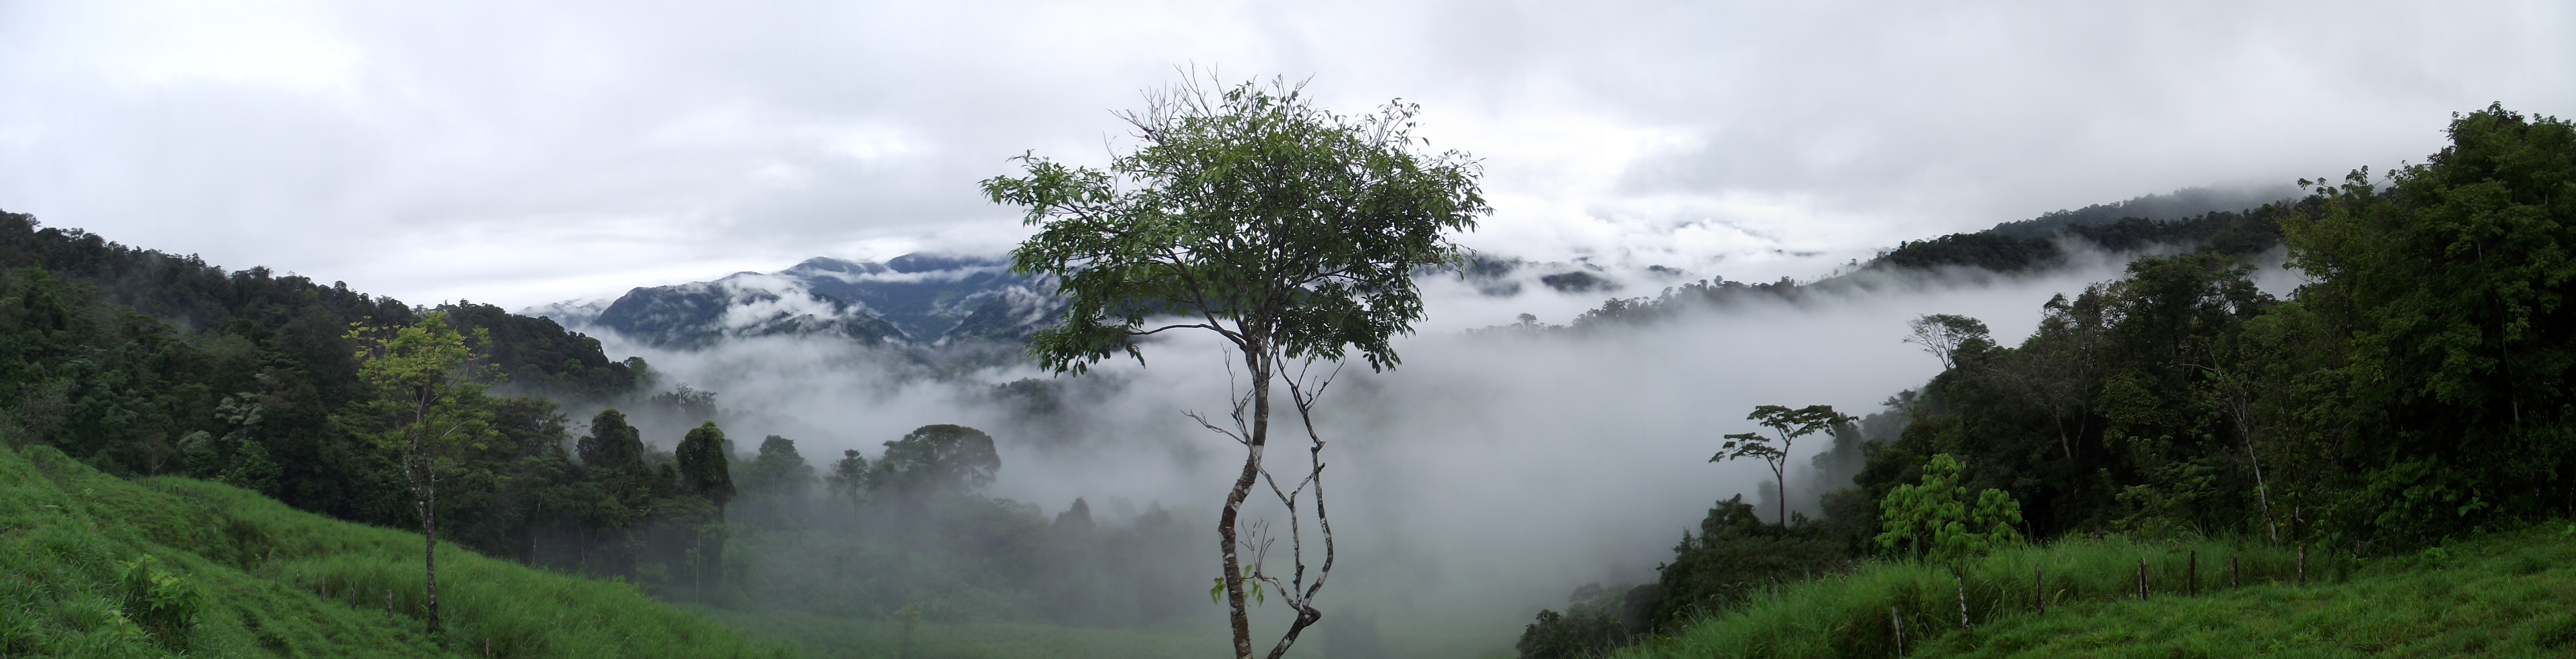 rainforest costa rica vacation coast to coast adventures.jpg